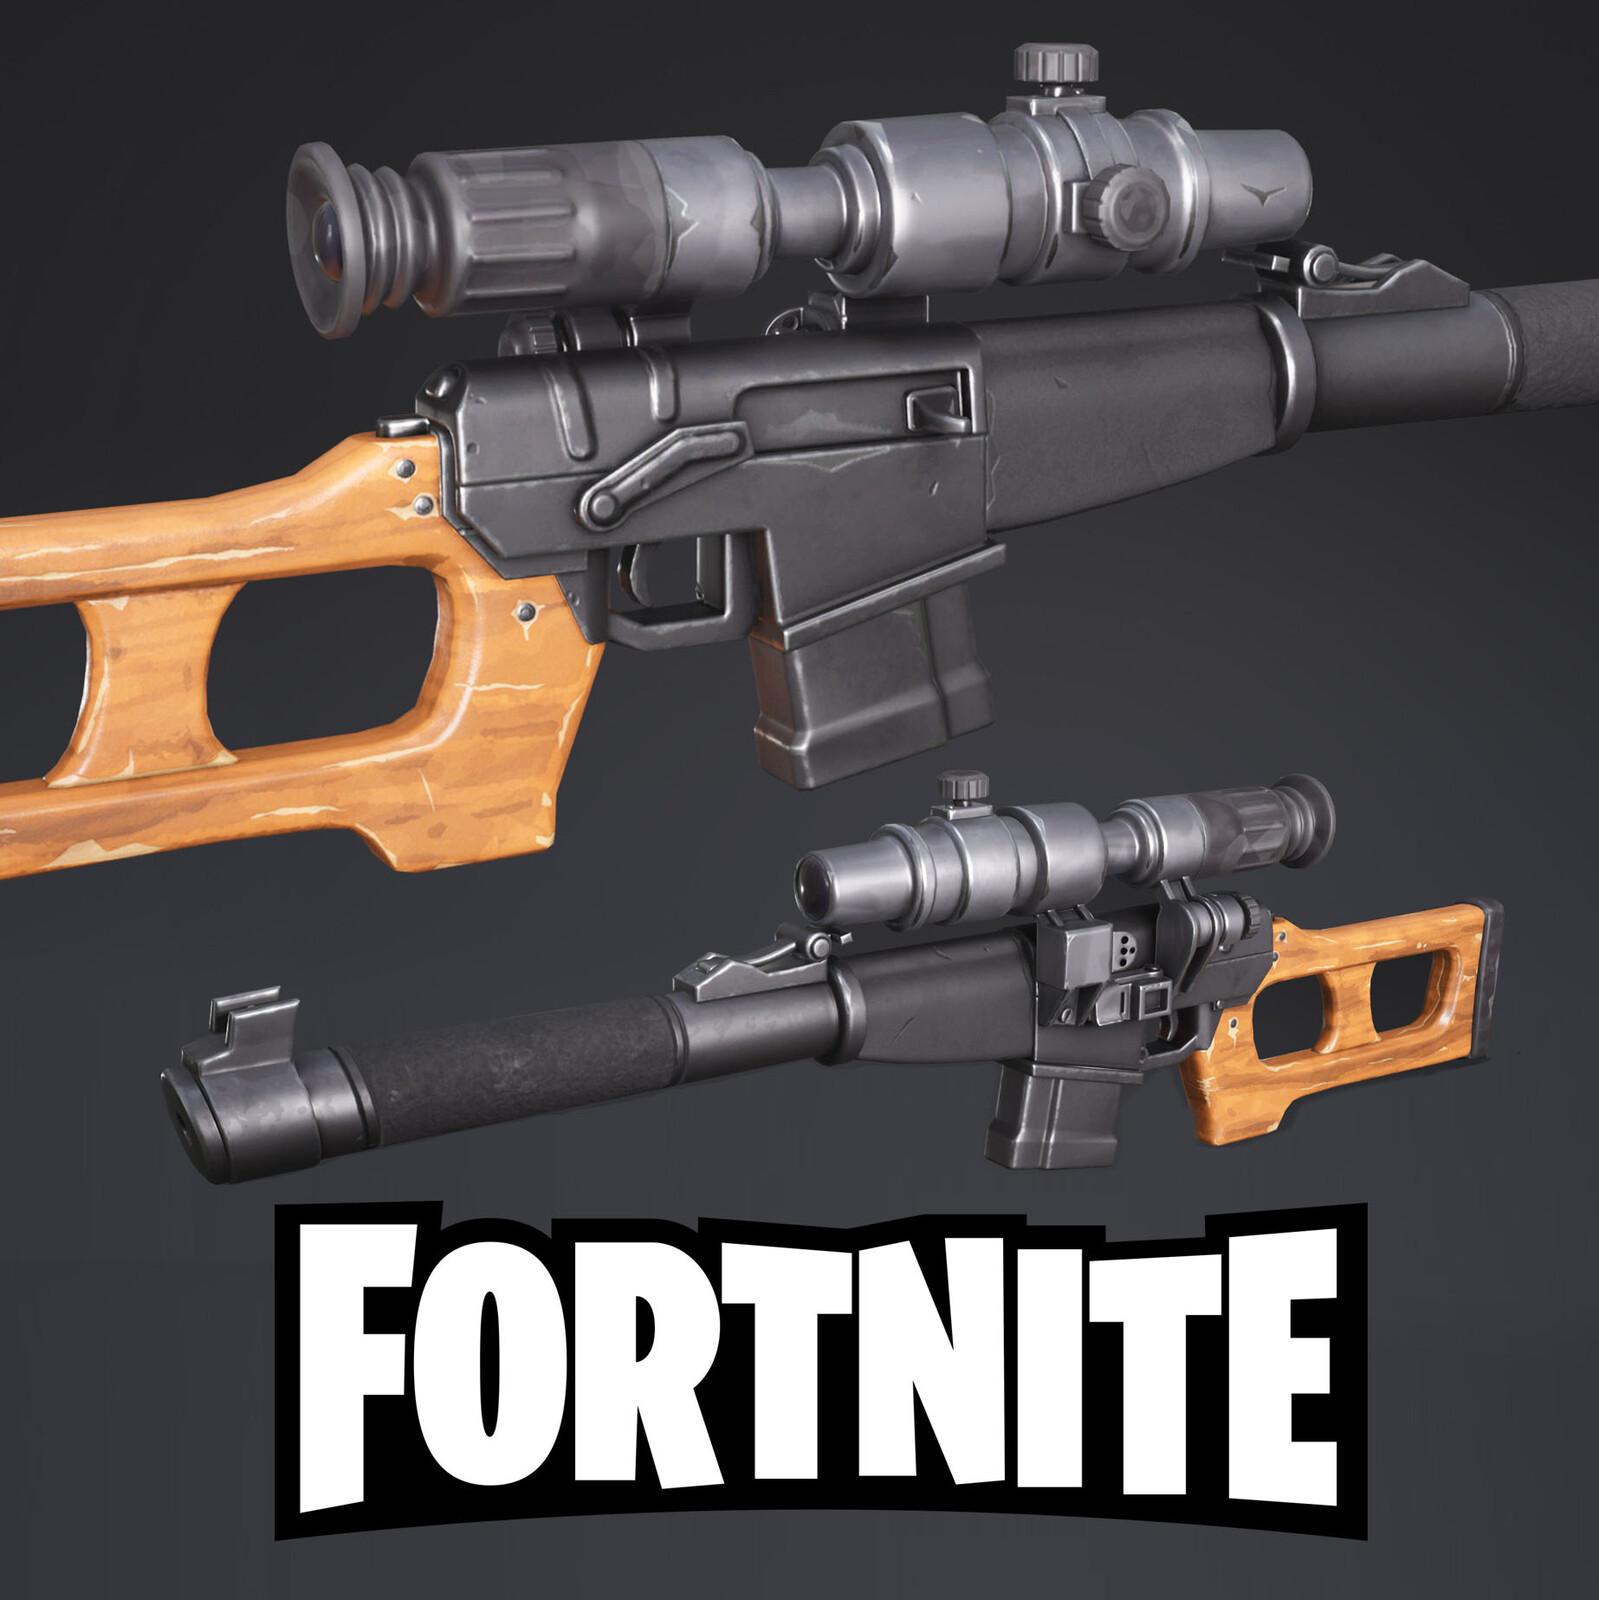 Fortnite - Auto sniper rifle